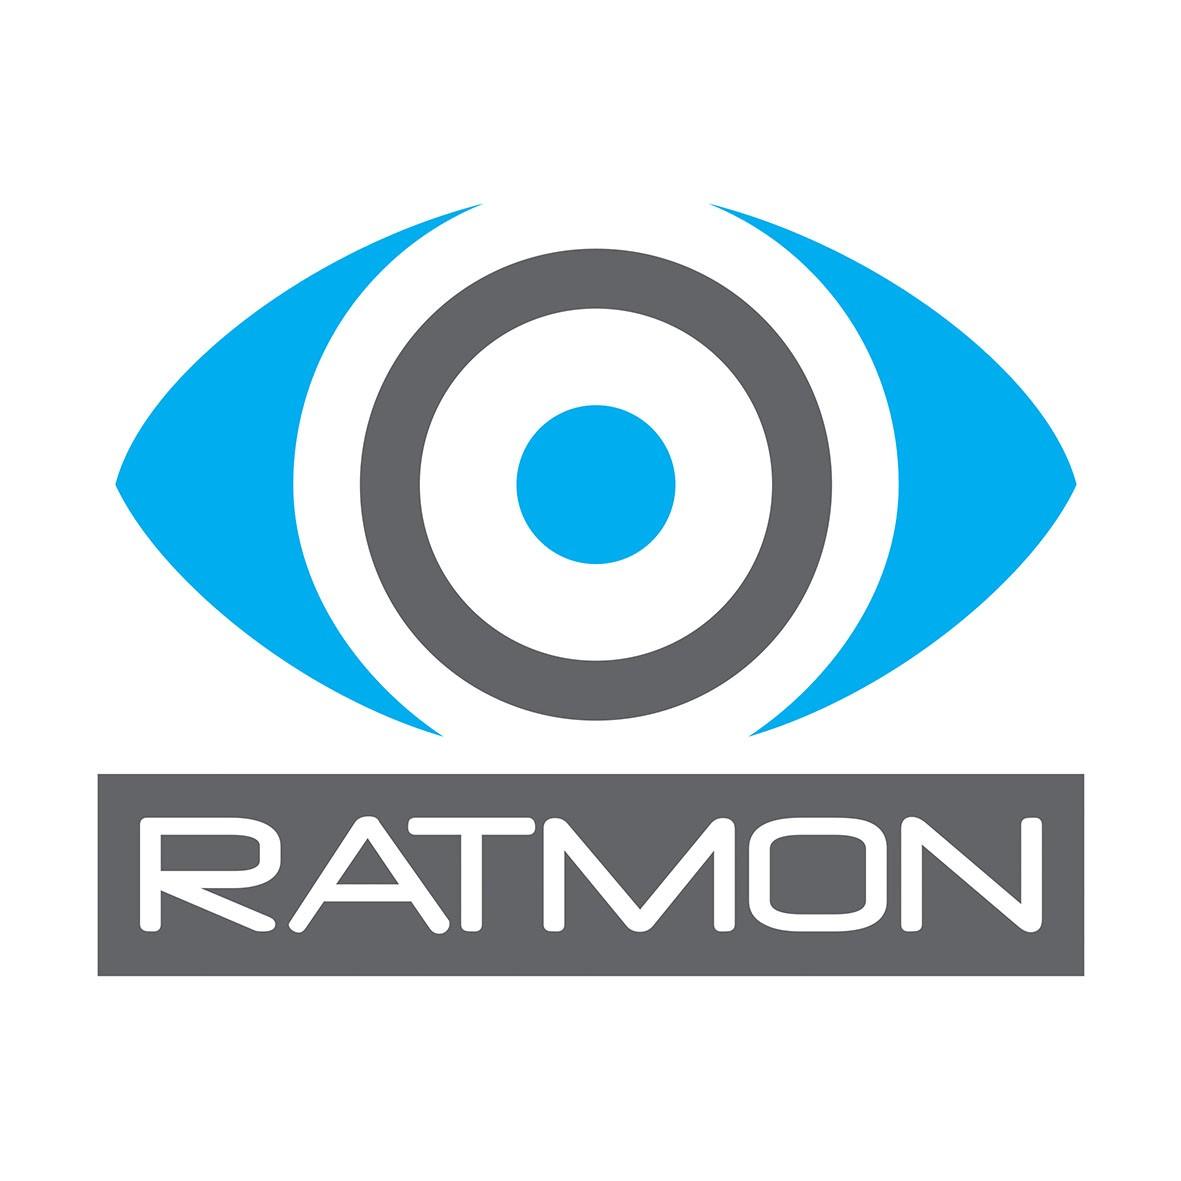 RATMON